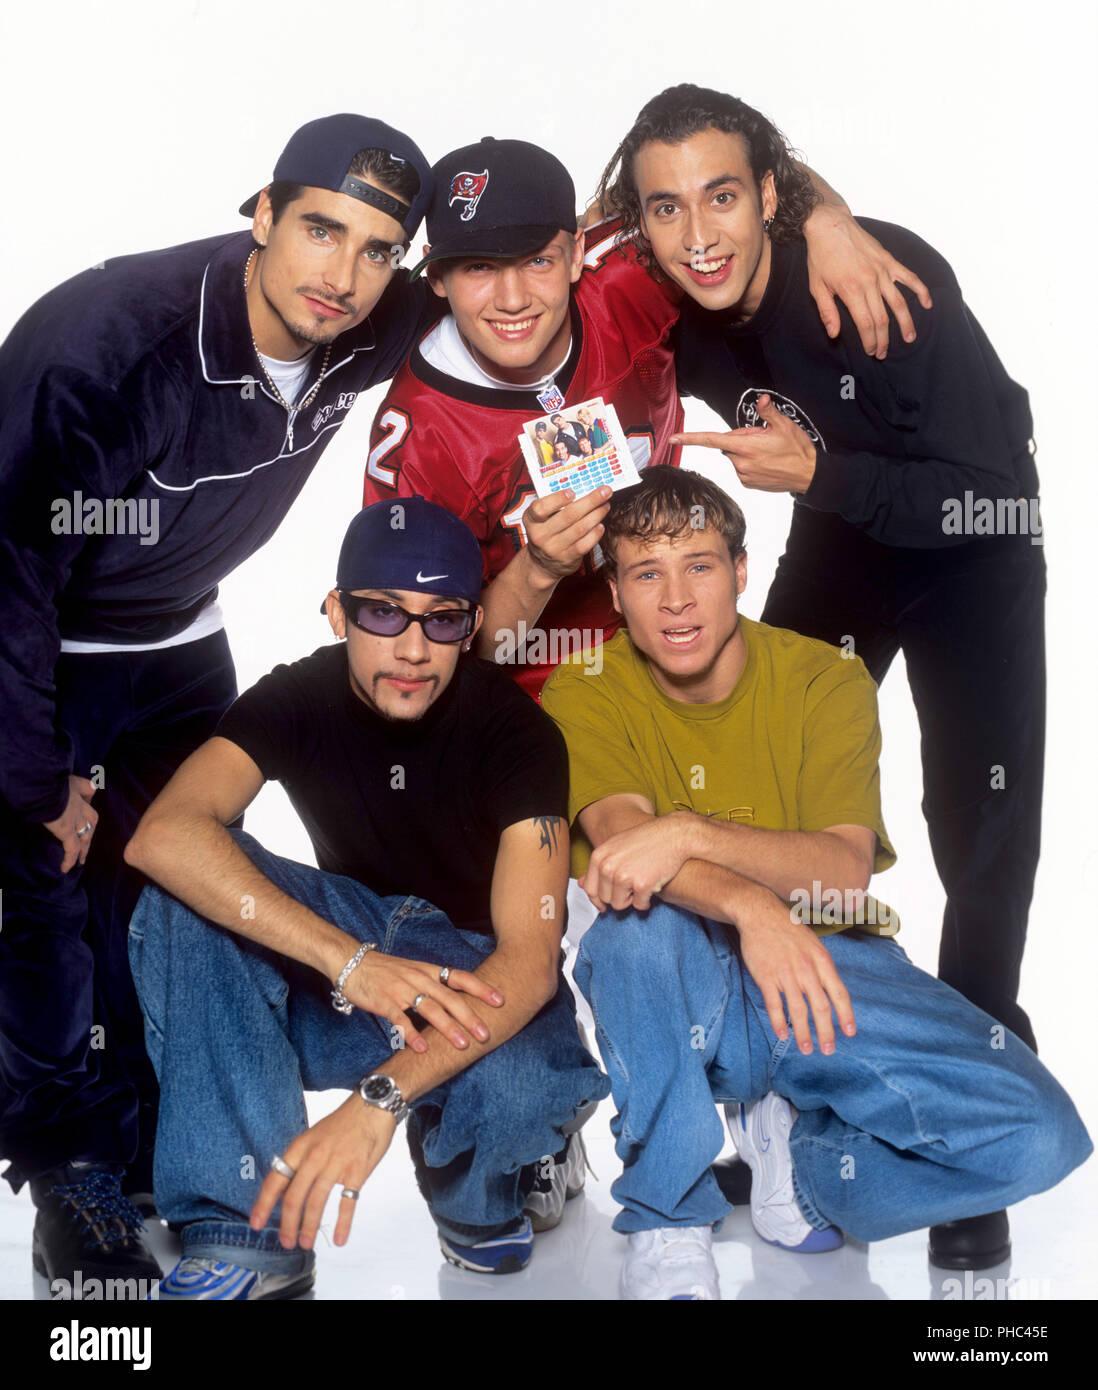 Backstreet Boys (l-r): Kevin Richardson, Alexander James McLean, Nick Carter, Brian Littrell, Howie Dorough on 15.07.1998 in Washington. | usage world - Stock Image